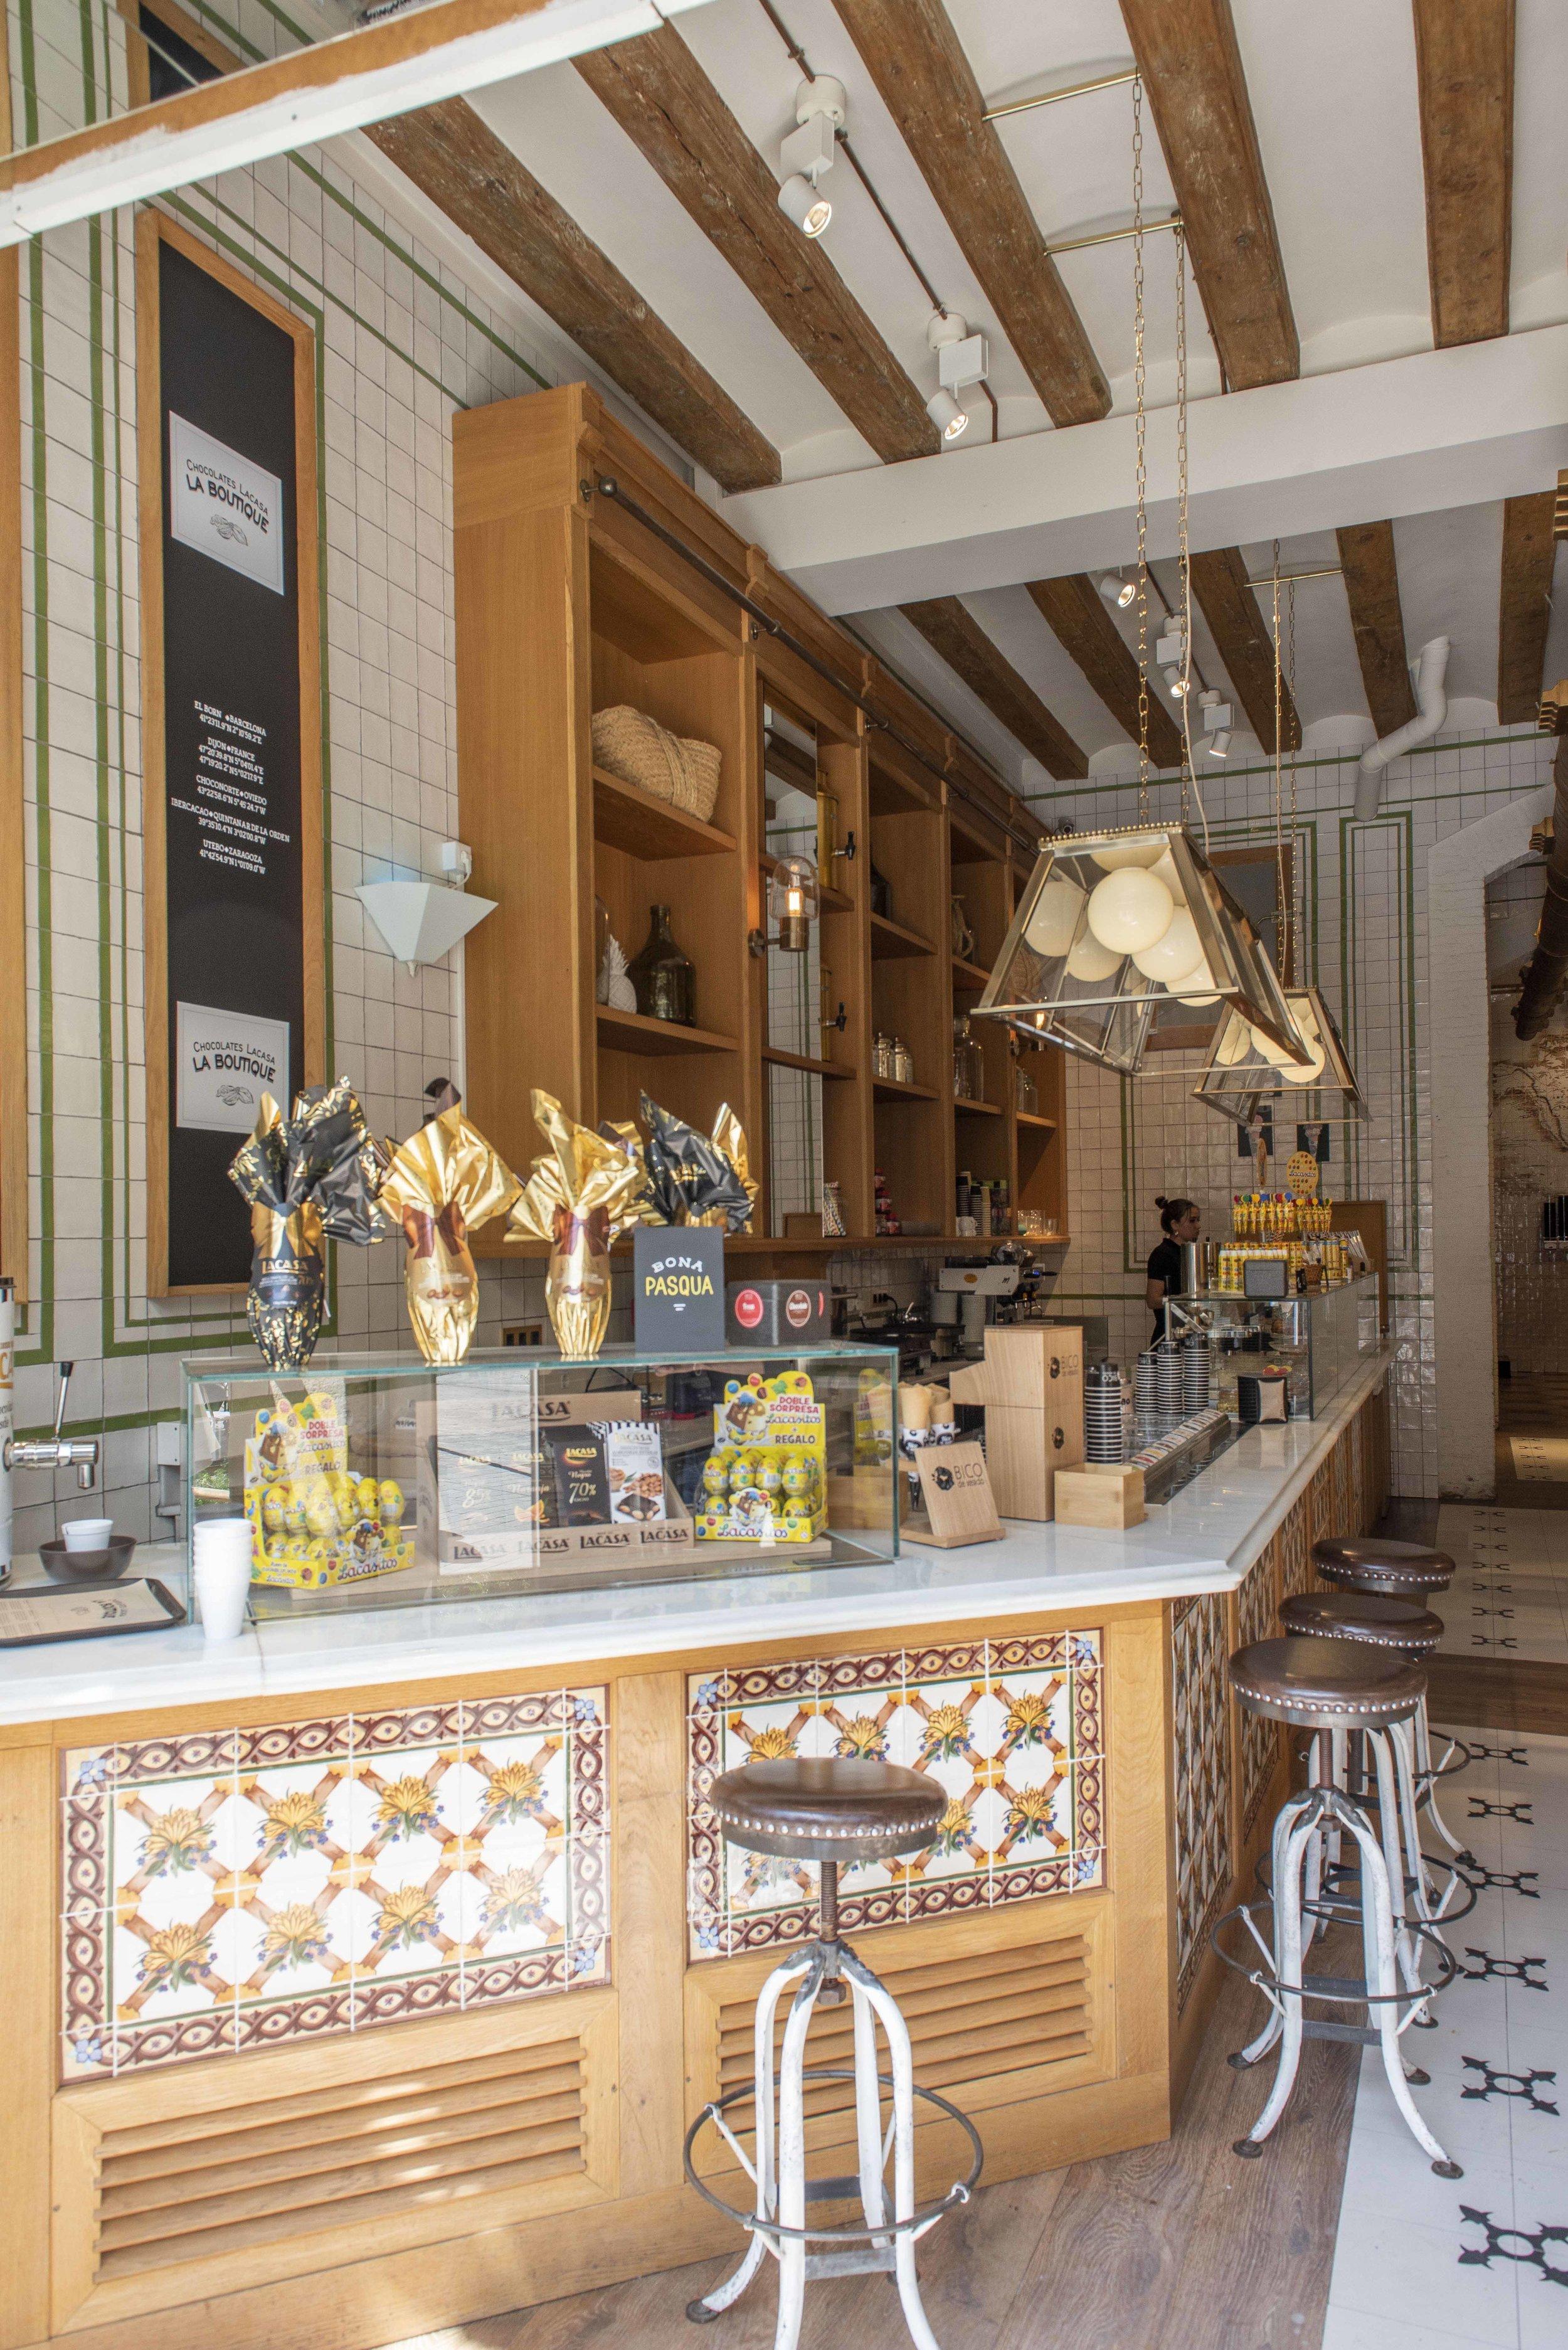 Chocolates Lacasa La Boutique, Barcelona. Photo © Barcelona Food Experience